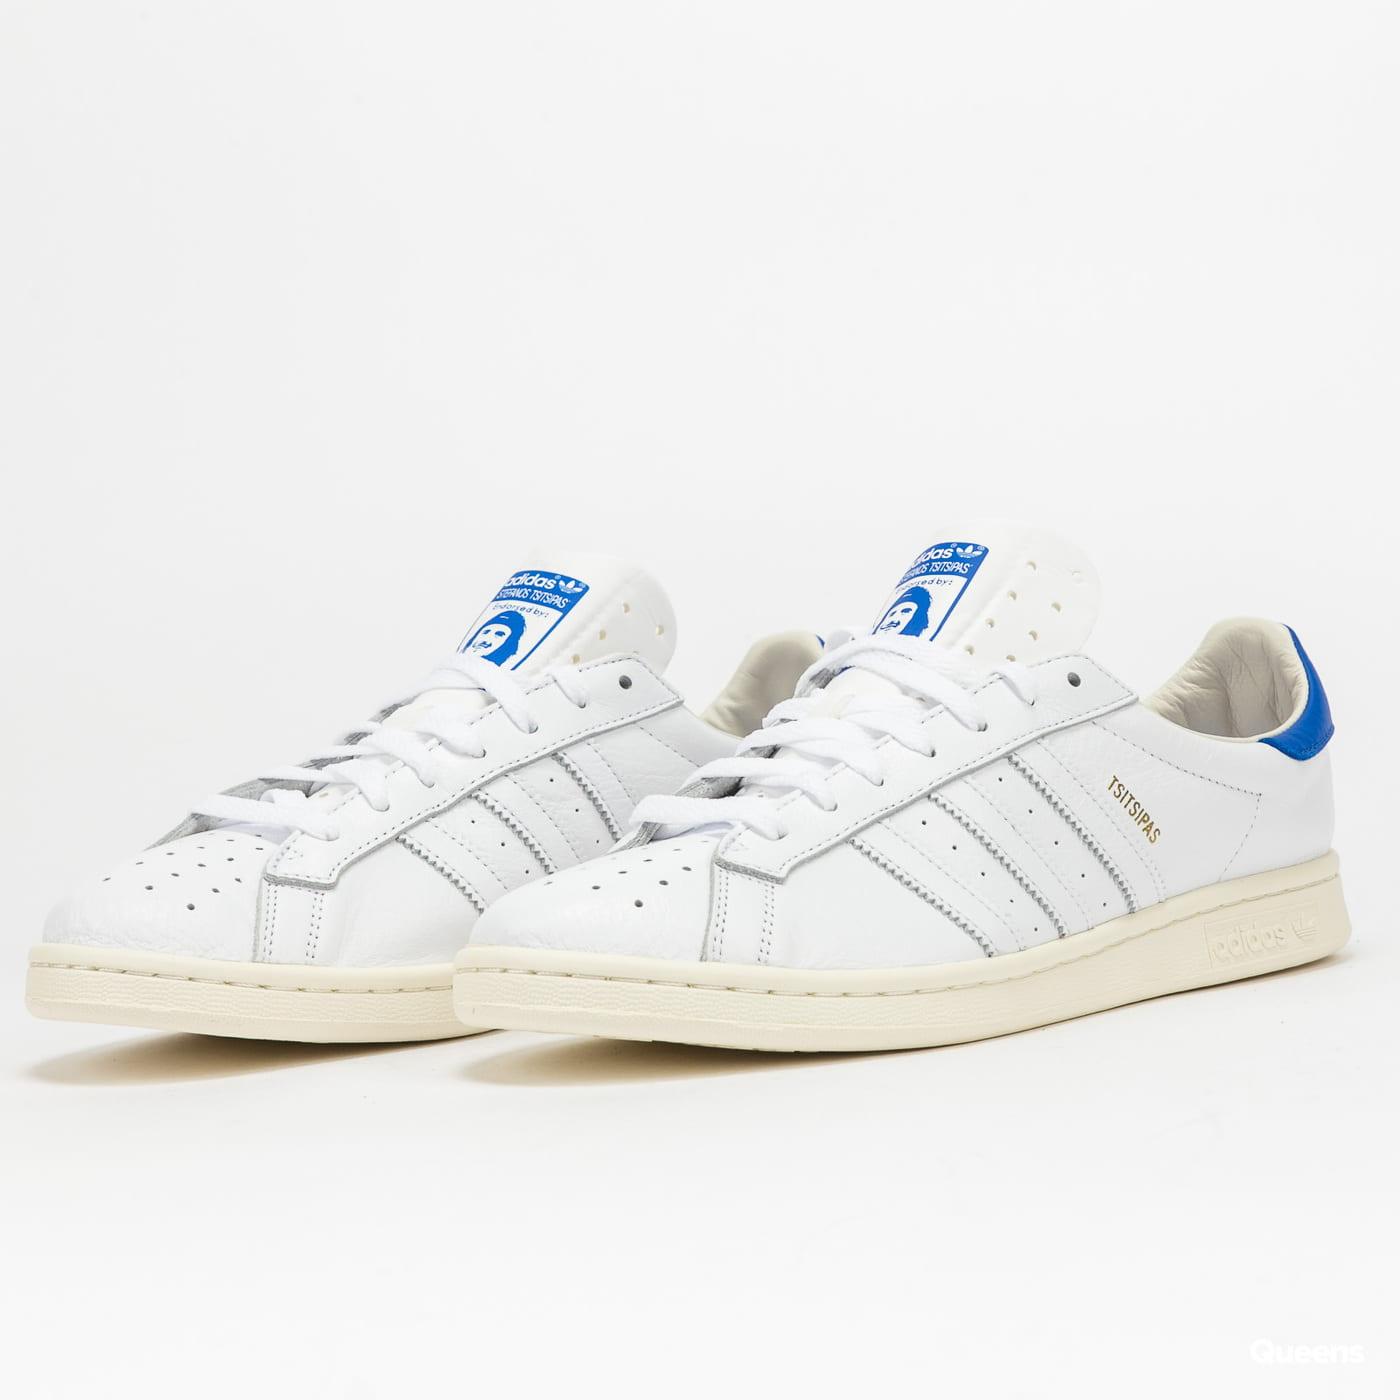 adidas Originals Earlham ftwwht / blue / cblack